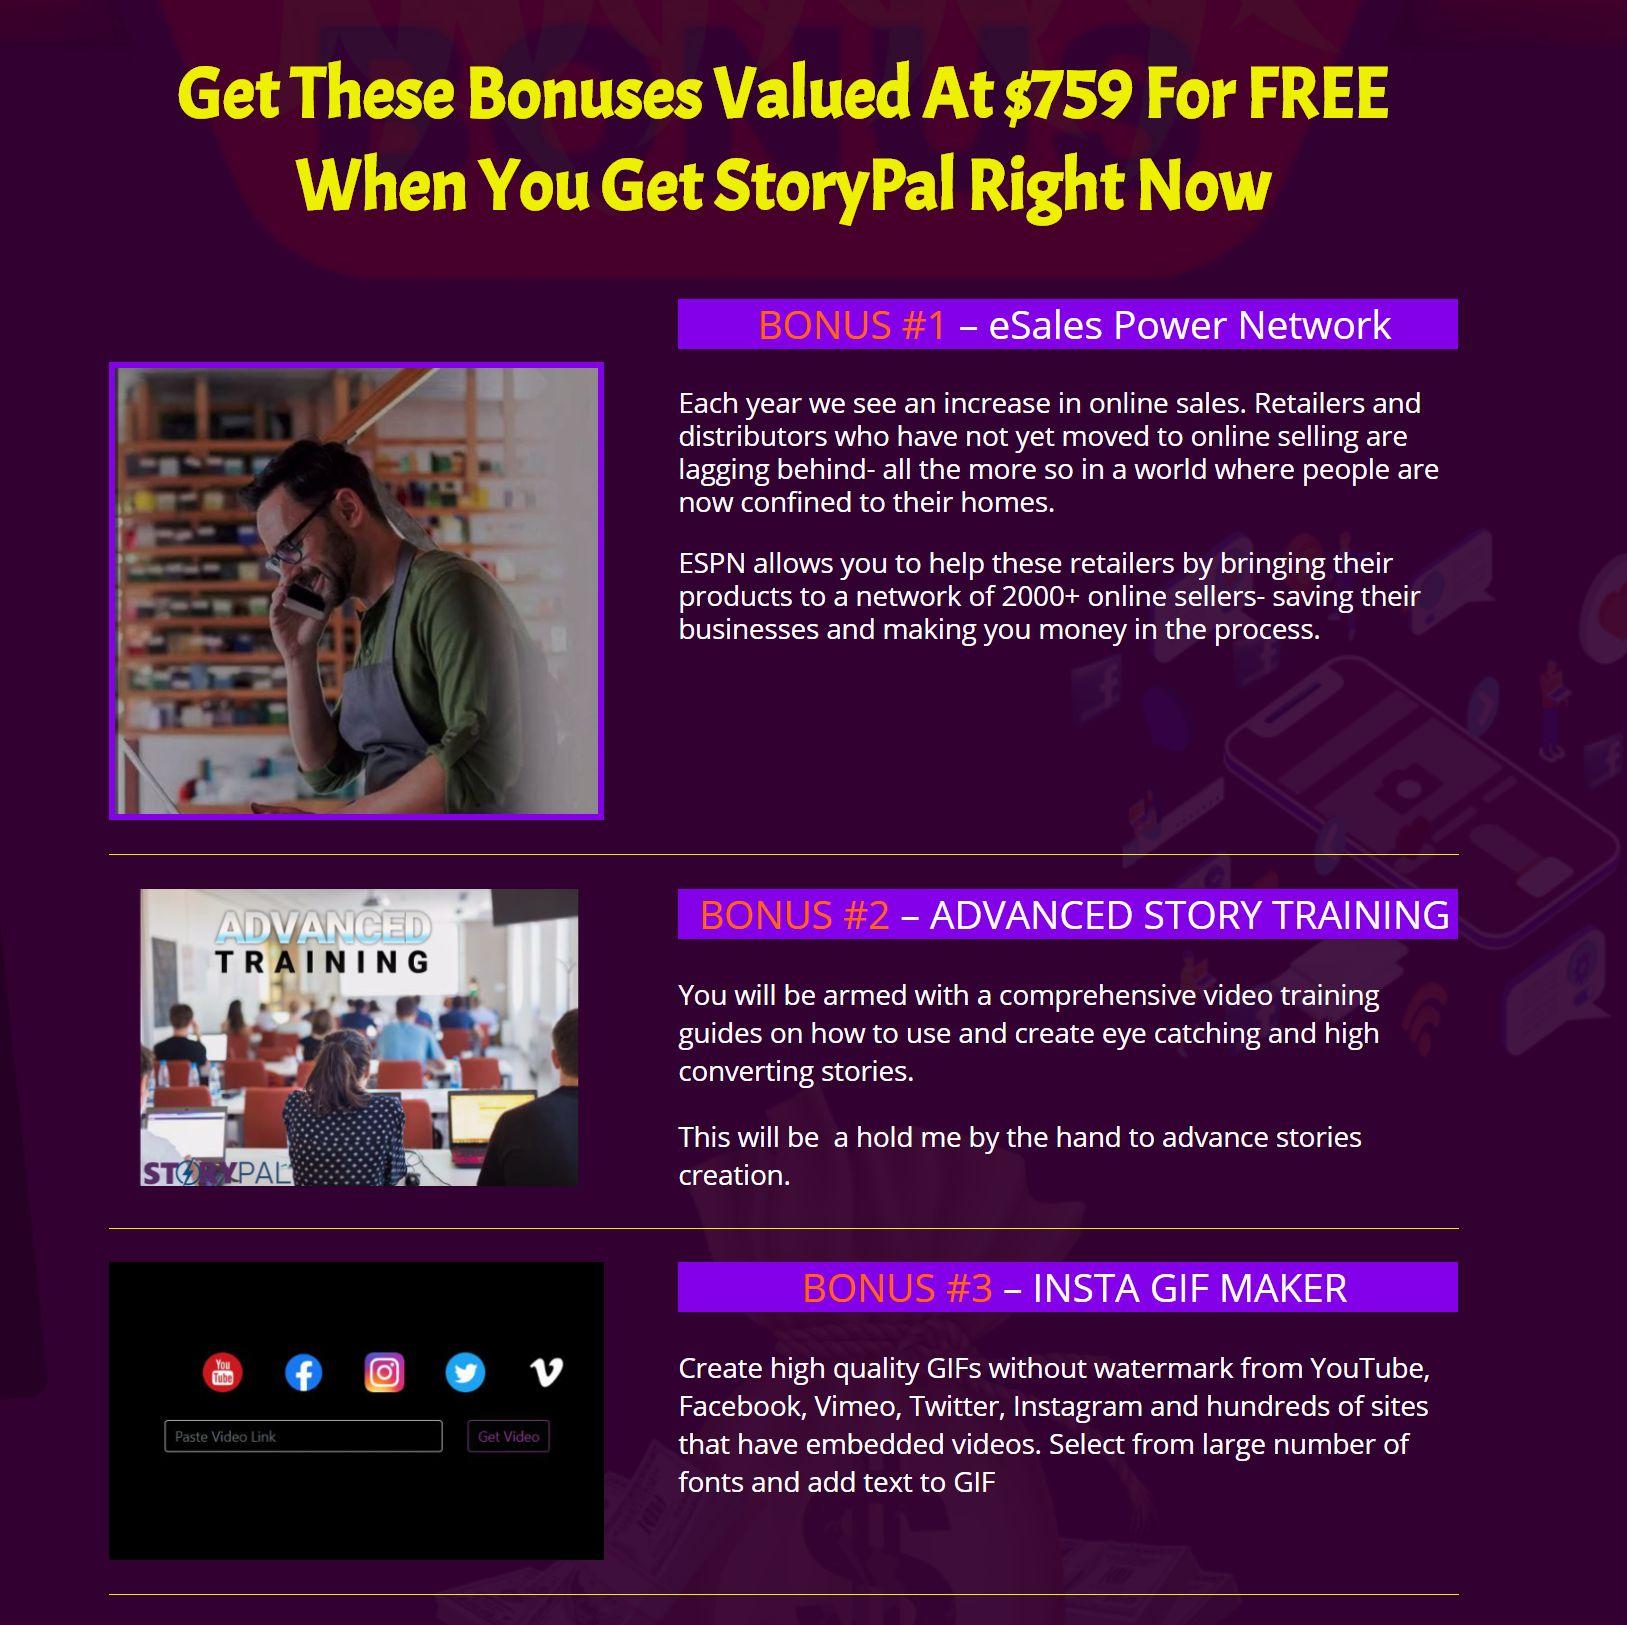 StoryPal-Bonus